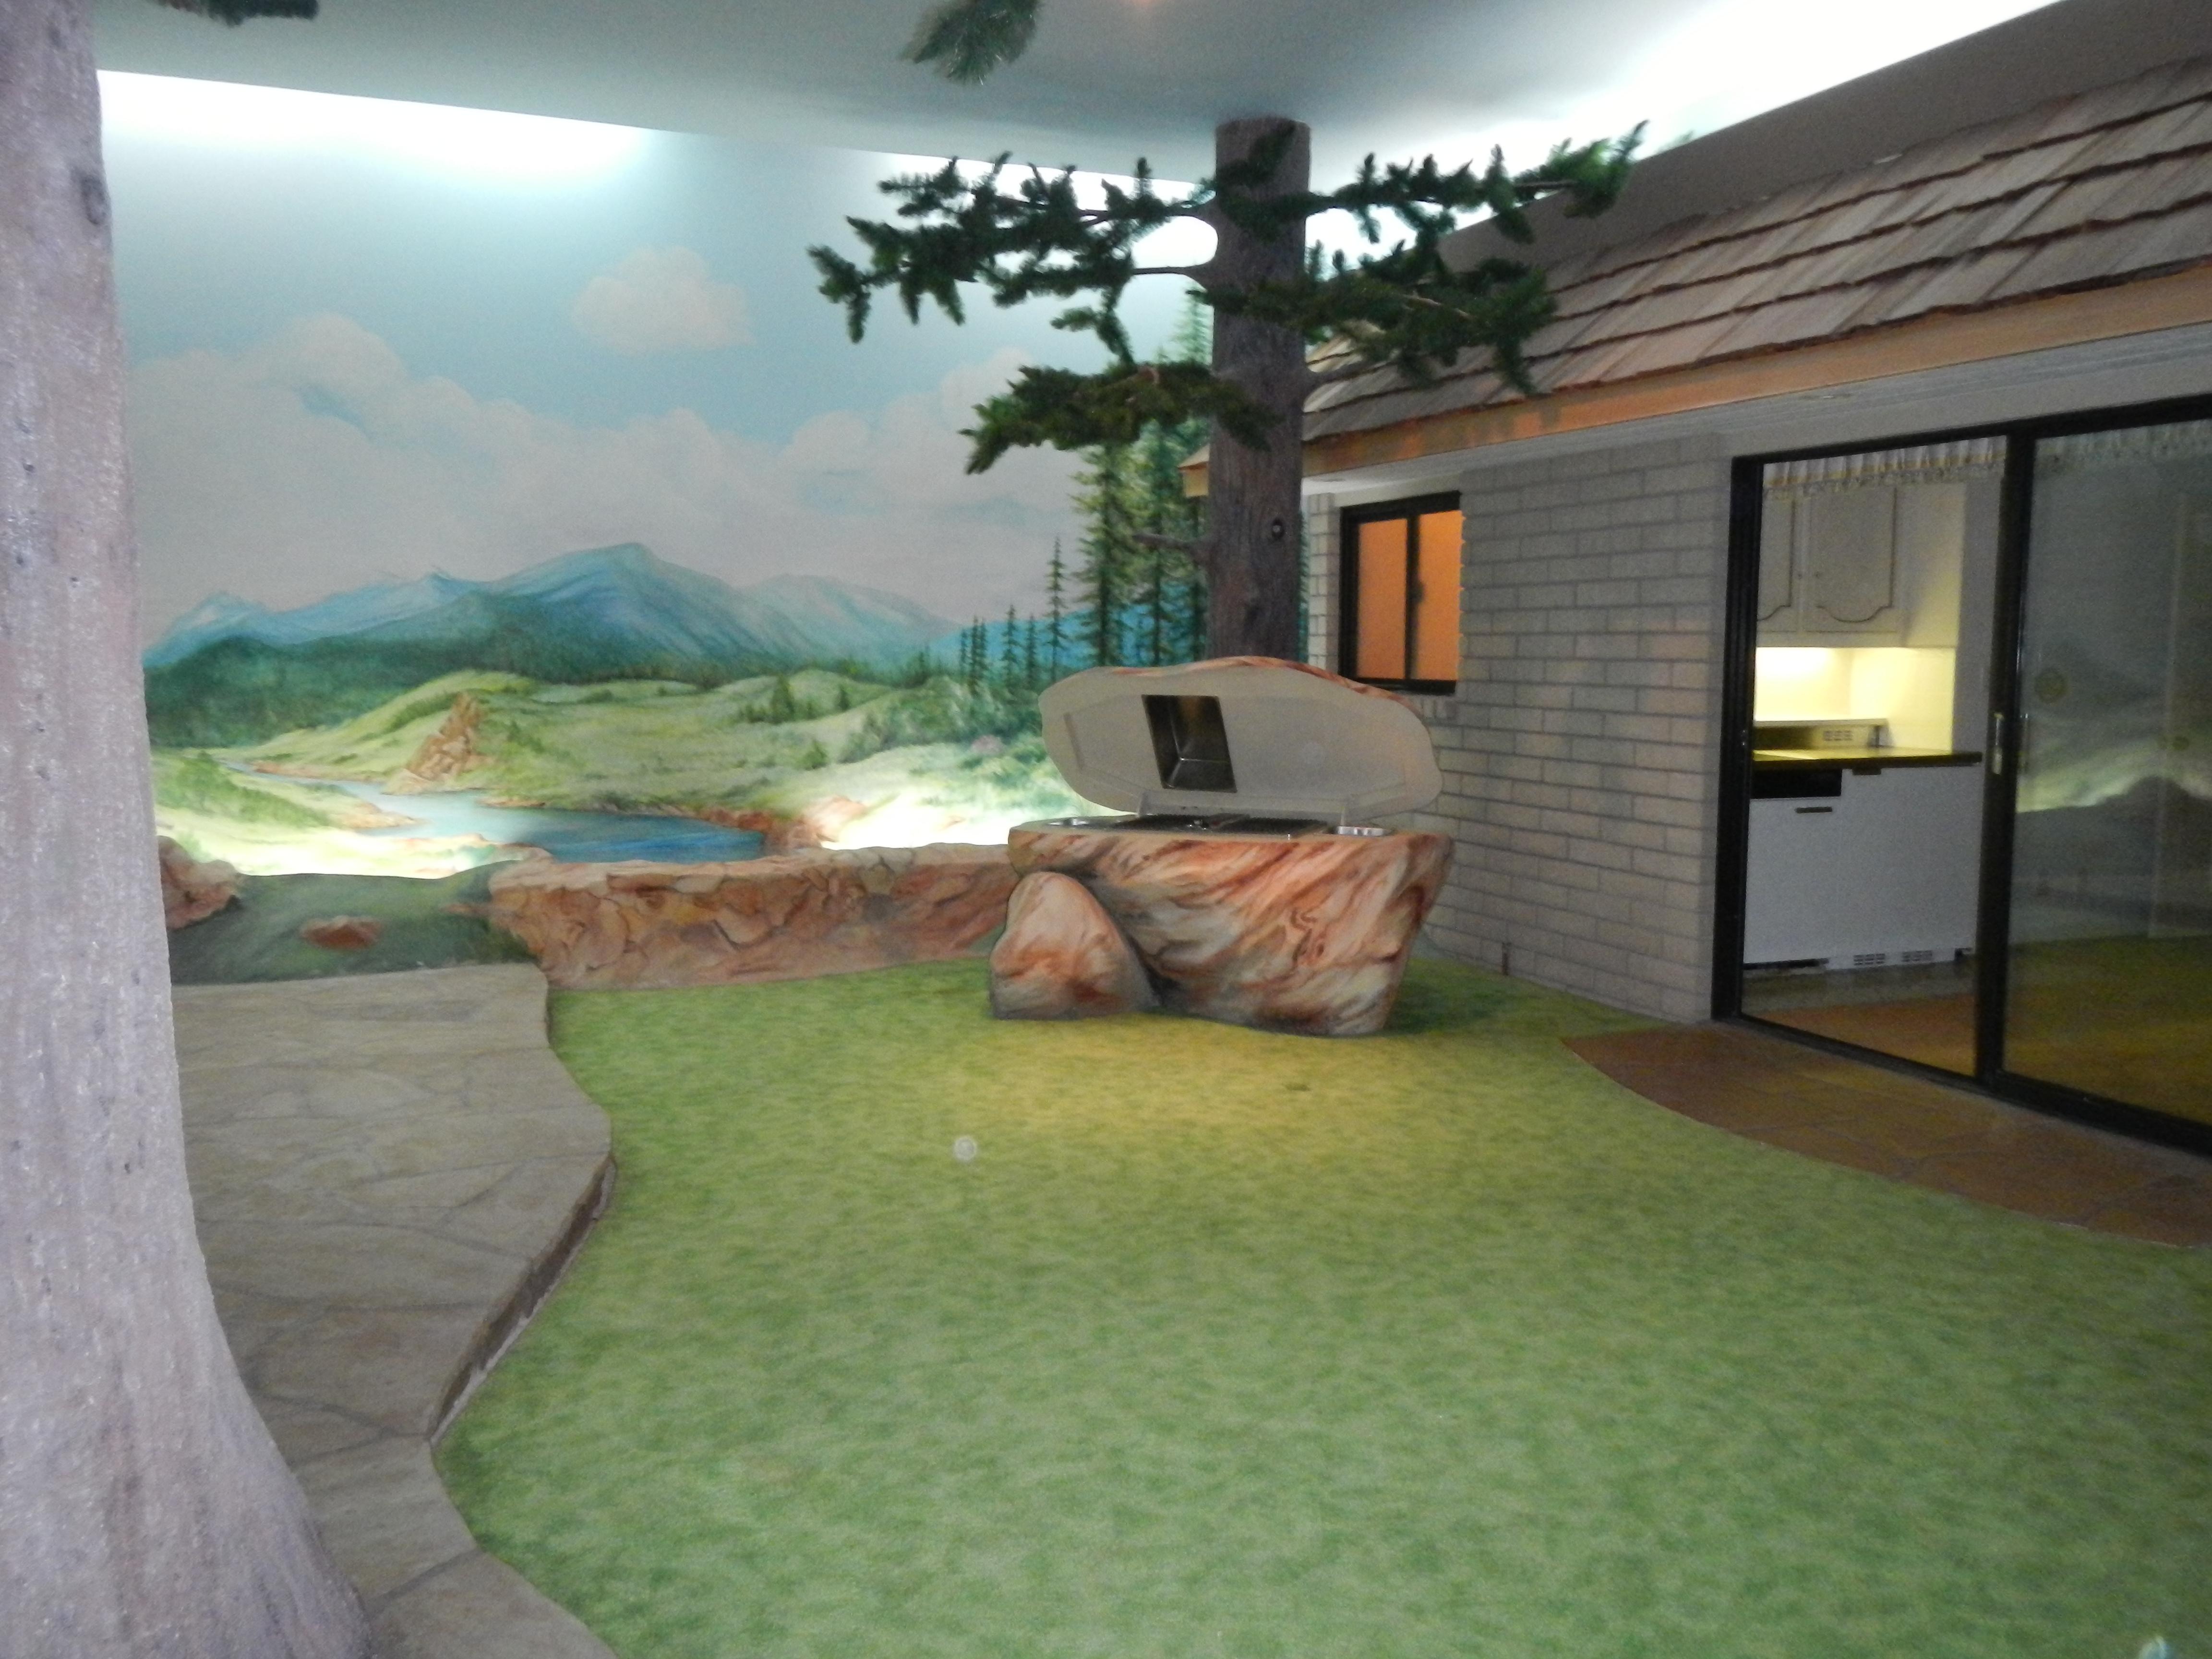 house of the week las vegas home built pletely underground